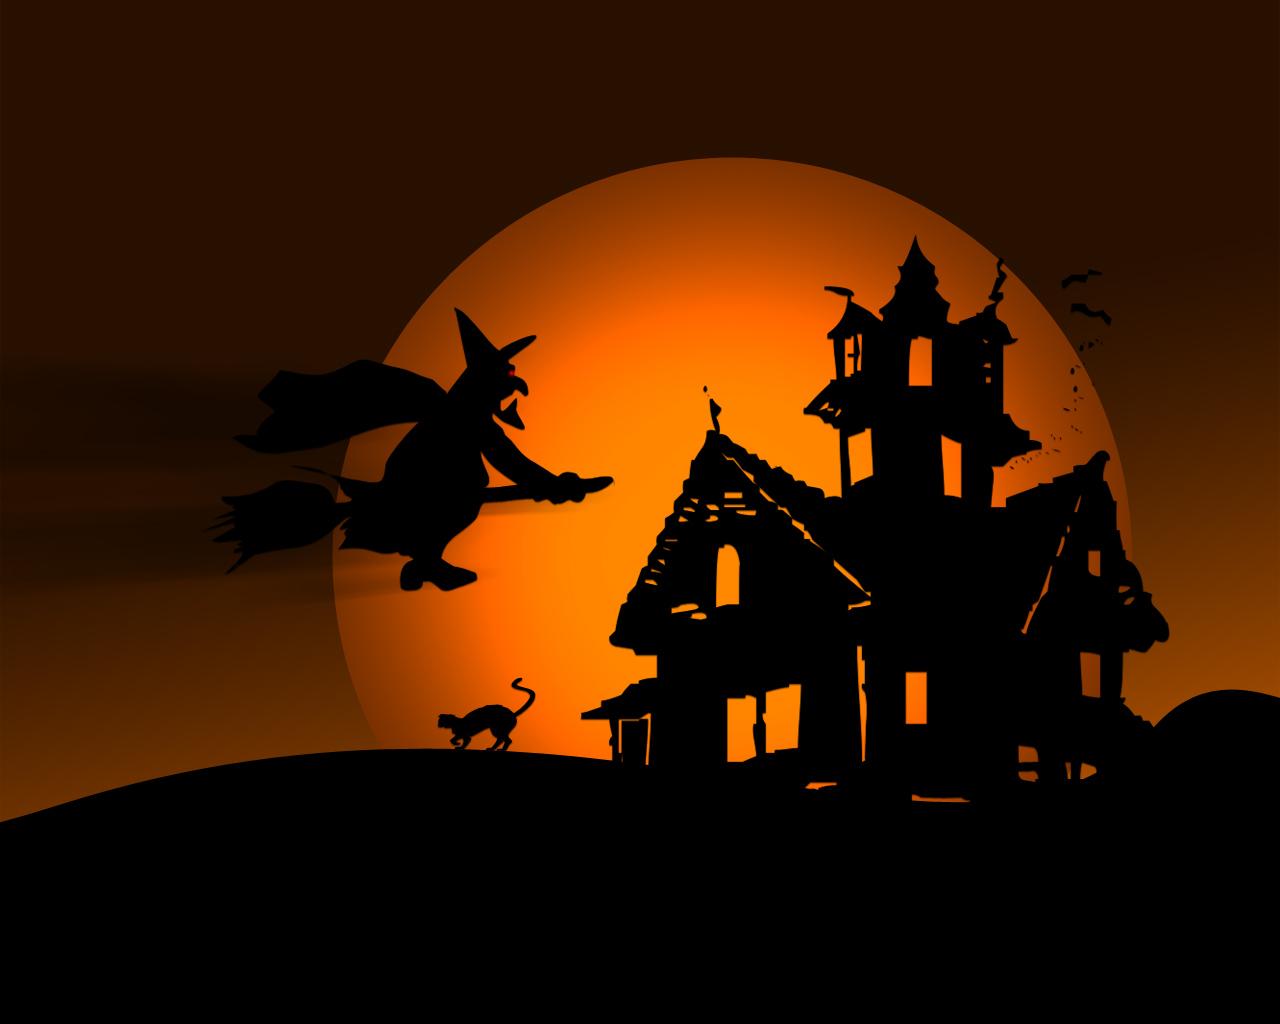 http://2.bp.blogspot.com/-iZtmY2esKVs/Tqv7nkfBszI/AAAAAAAAC1Y/T-Rk5IHoejY/s1600/halloween-wallpaper-55.jpg